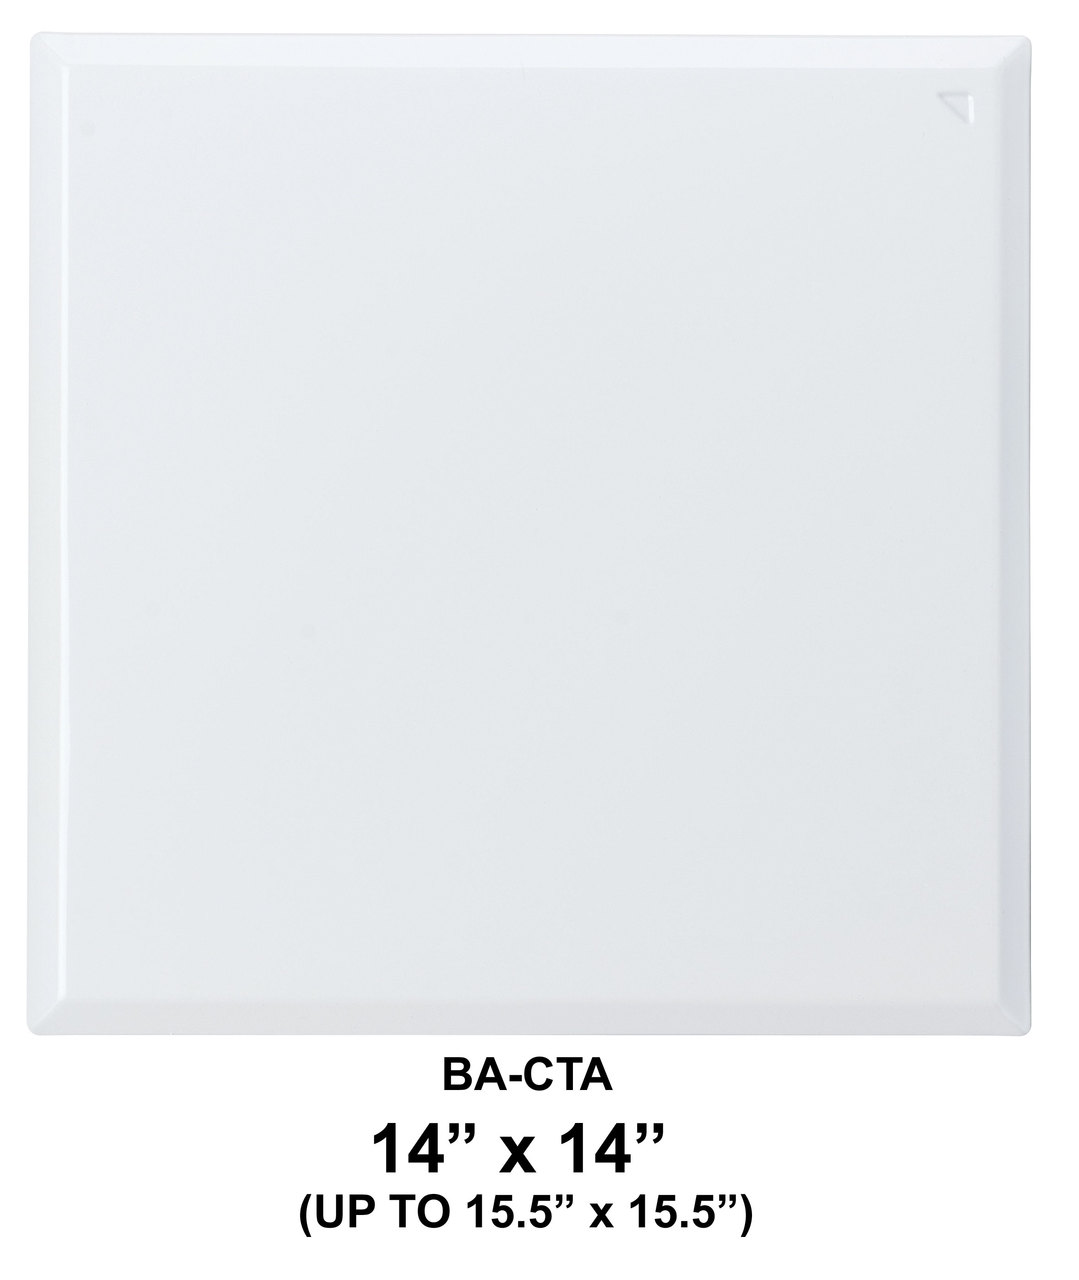 Best Access Doors BA-CTA 14